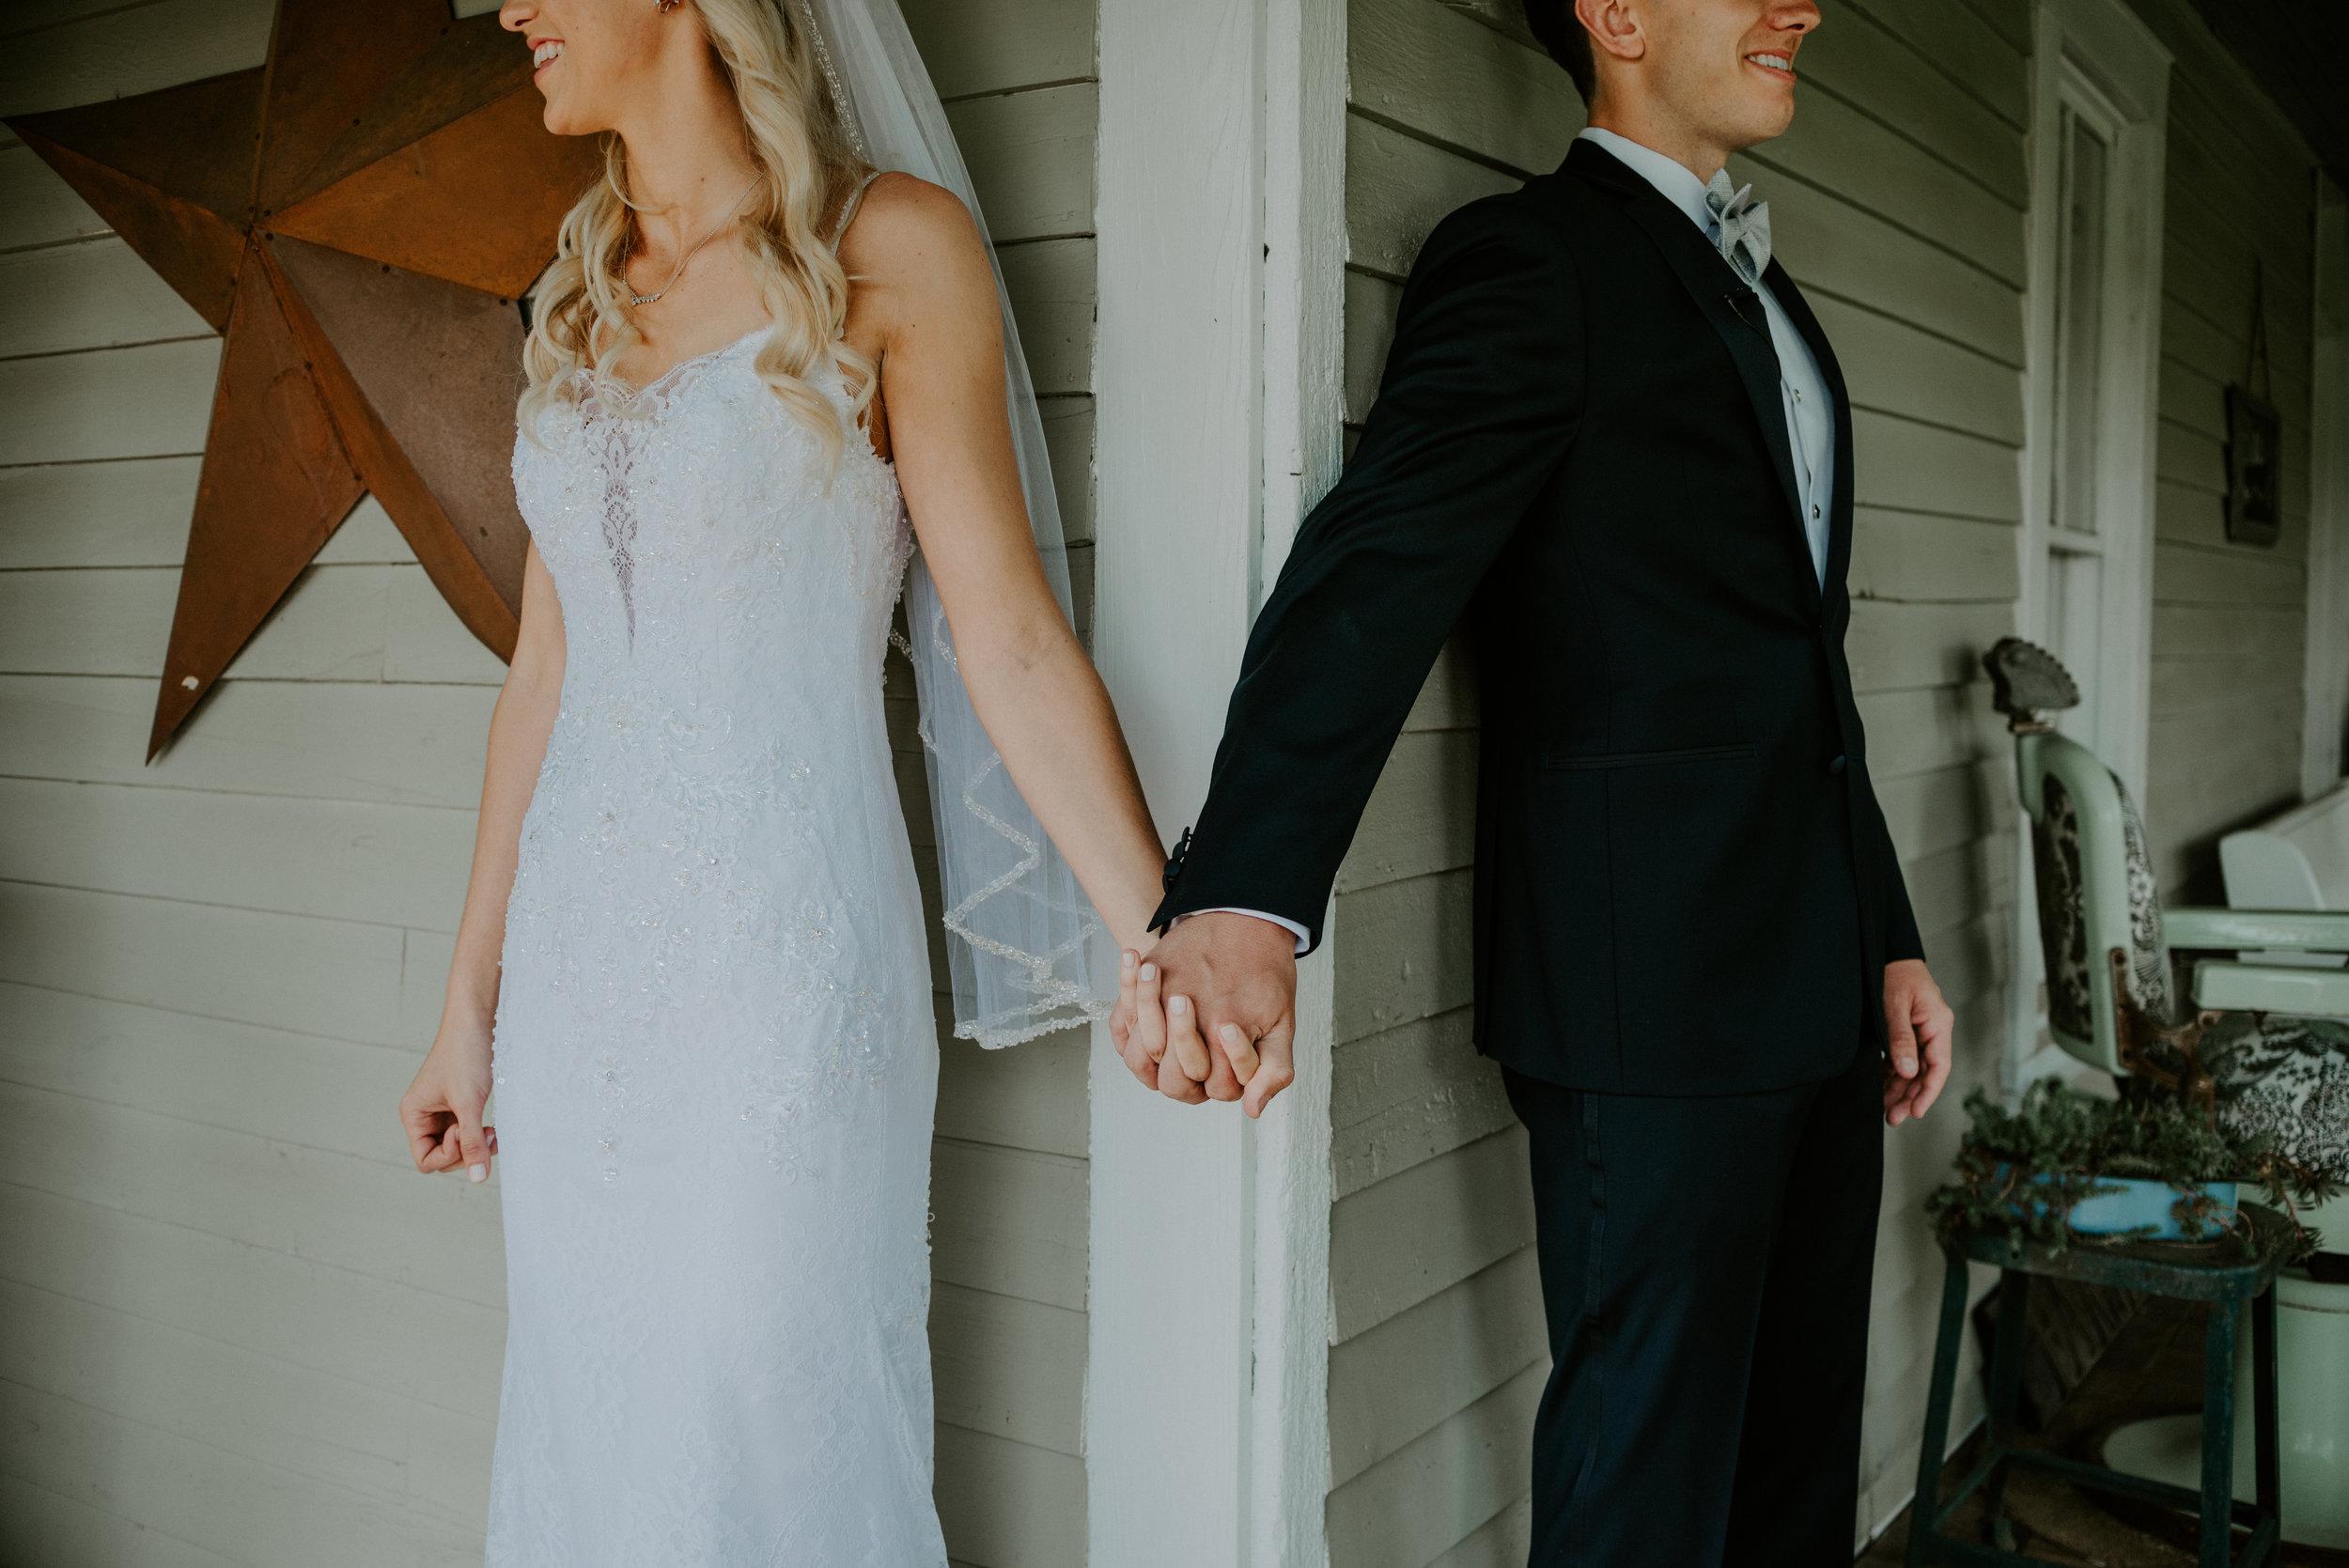 WonderlyCreative_Wedding_4.28.18_Lauren&Josh_-181.jpg